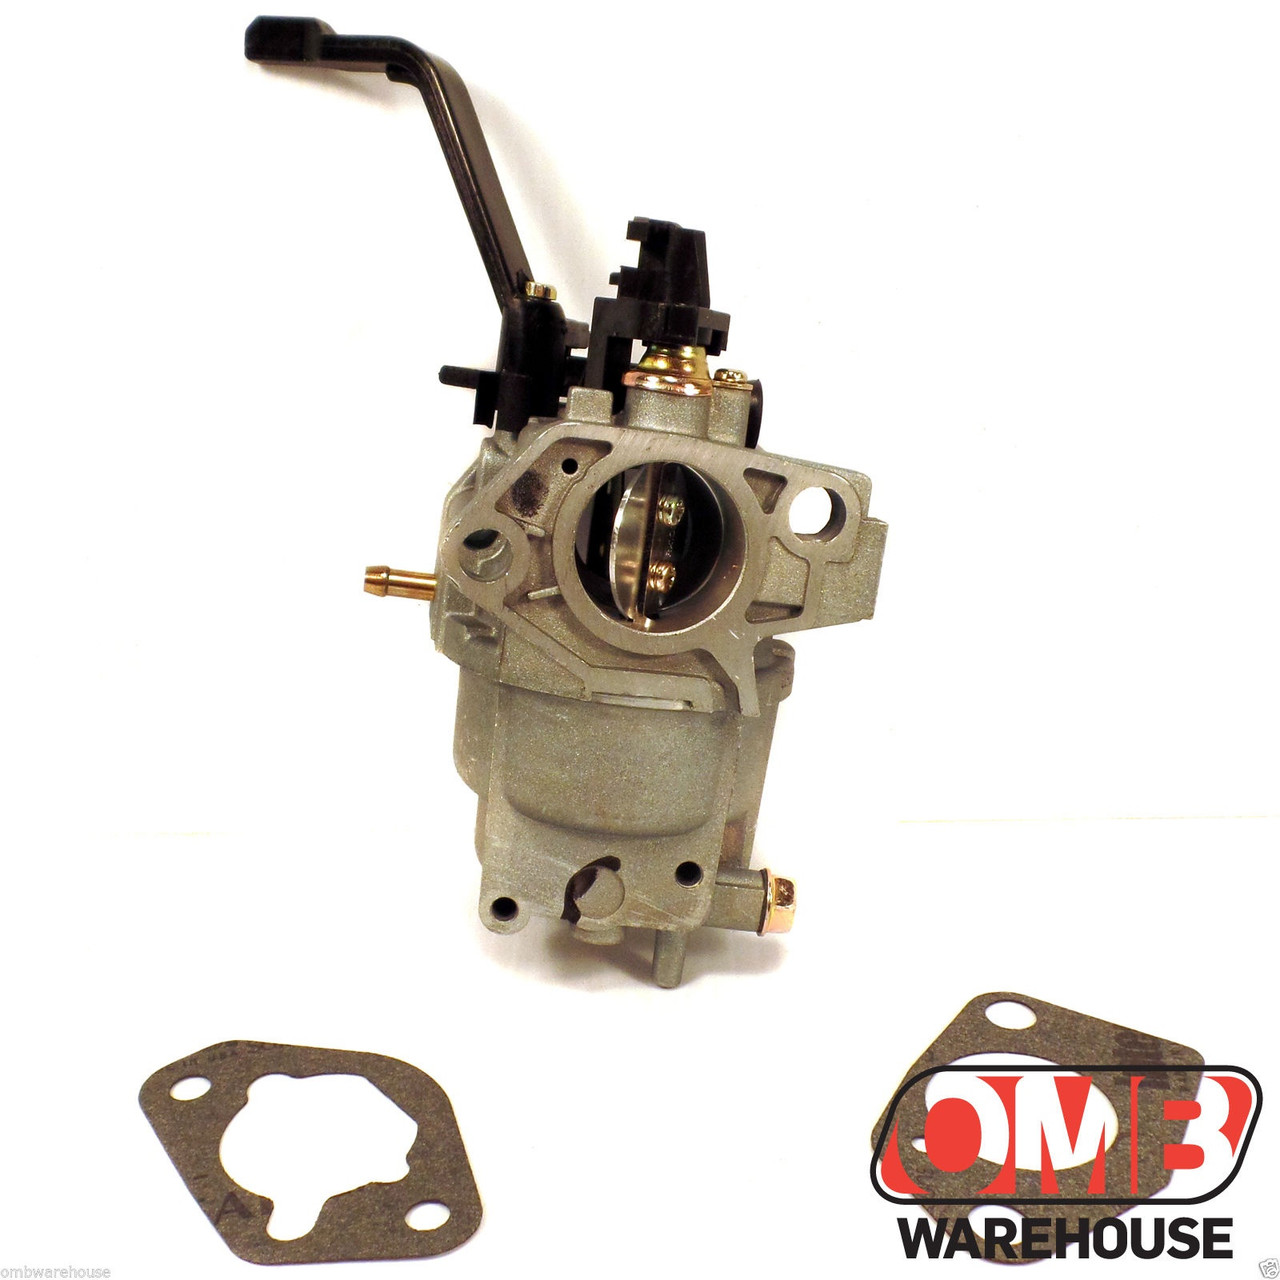 Generac 0J58620157 OEM Carburetor - Includes Gaskets Fits GP5500 GP6500E GP7500E